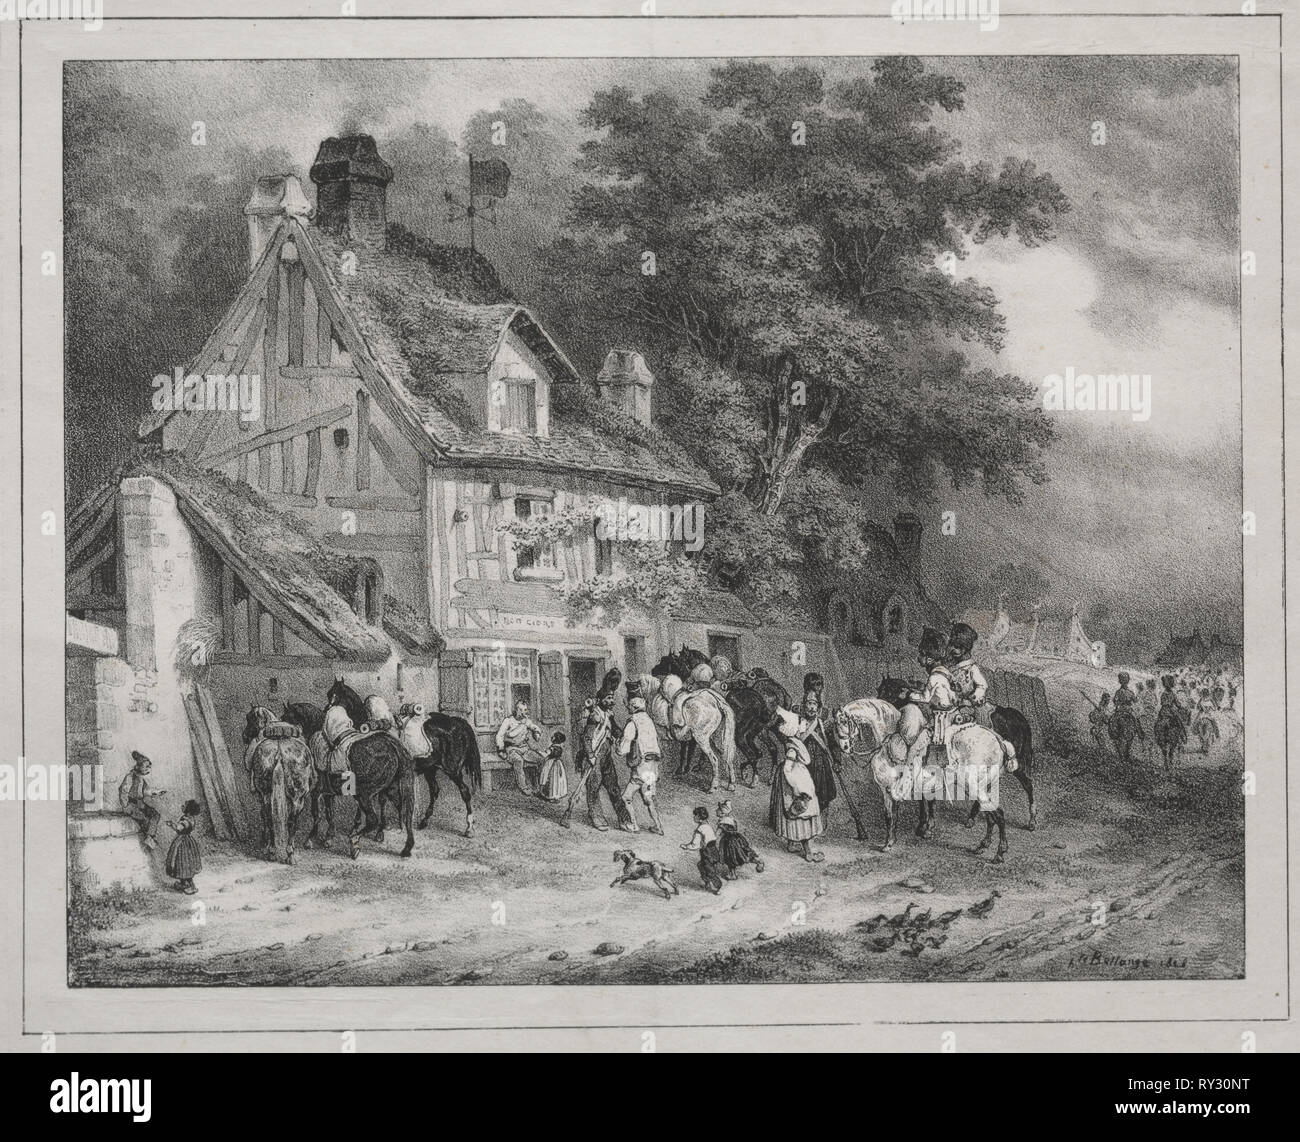 Album von 1829: Souvenir der Normandie, 1828. Joseph-Louis-Hippolyte Bellangé (Französisch, 1800-1866), Gihaut frères Éditeur, Boulevard des Italiens, Nr. 5. Lithographie; Blatt: 22,7 x 29,1 cm (8 15/16 x 11 7/16 in.); Bild: 16,4 x 20,9 cm (6 5/6 x 8 1/4 Zoll Stockbild